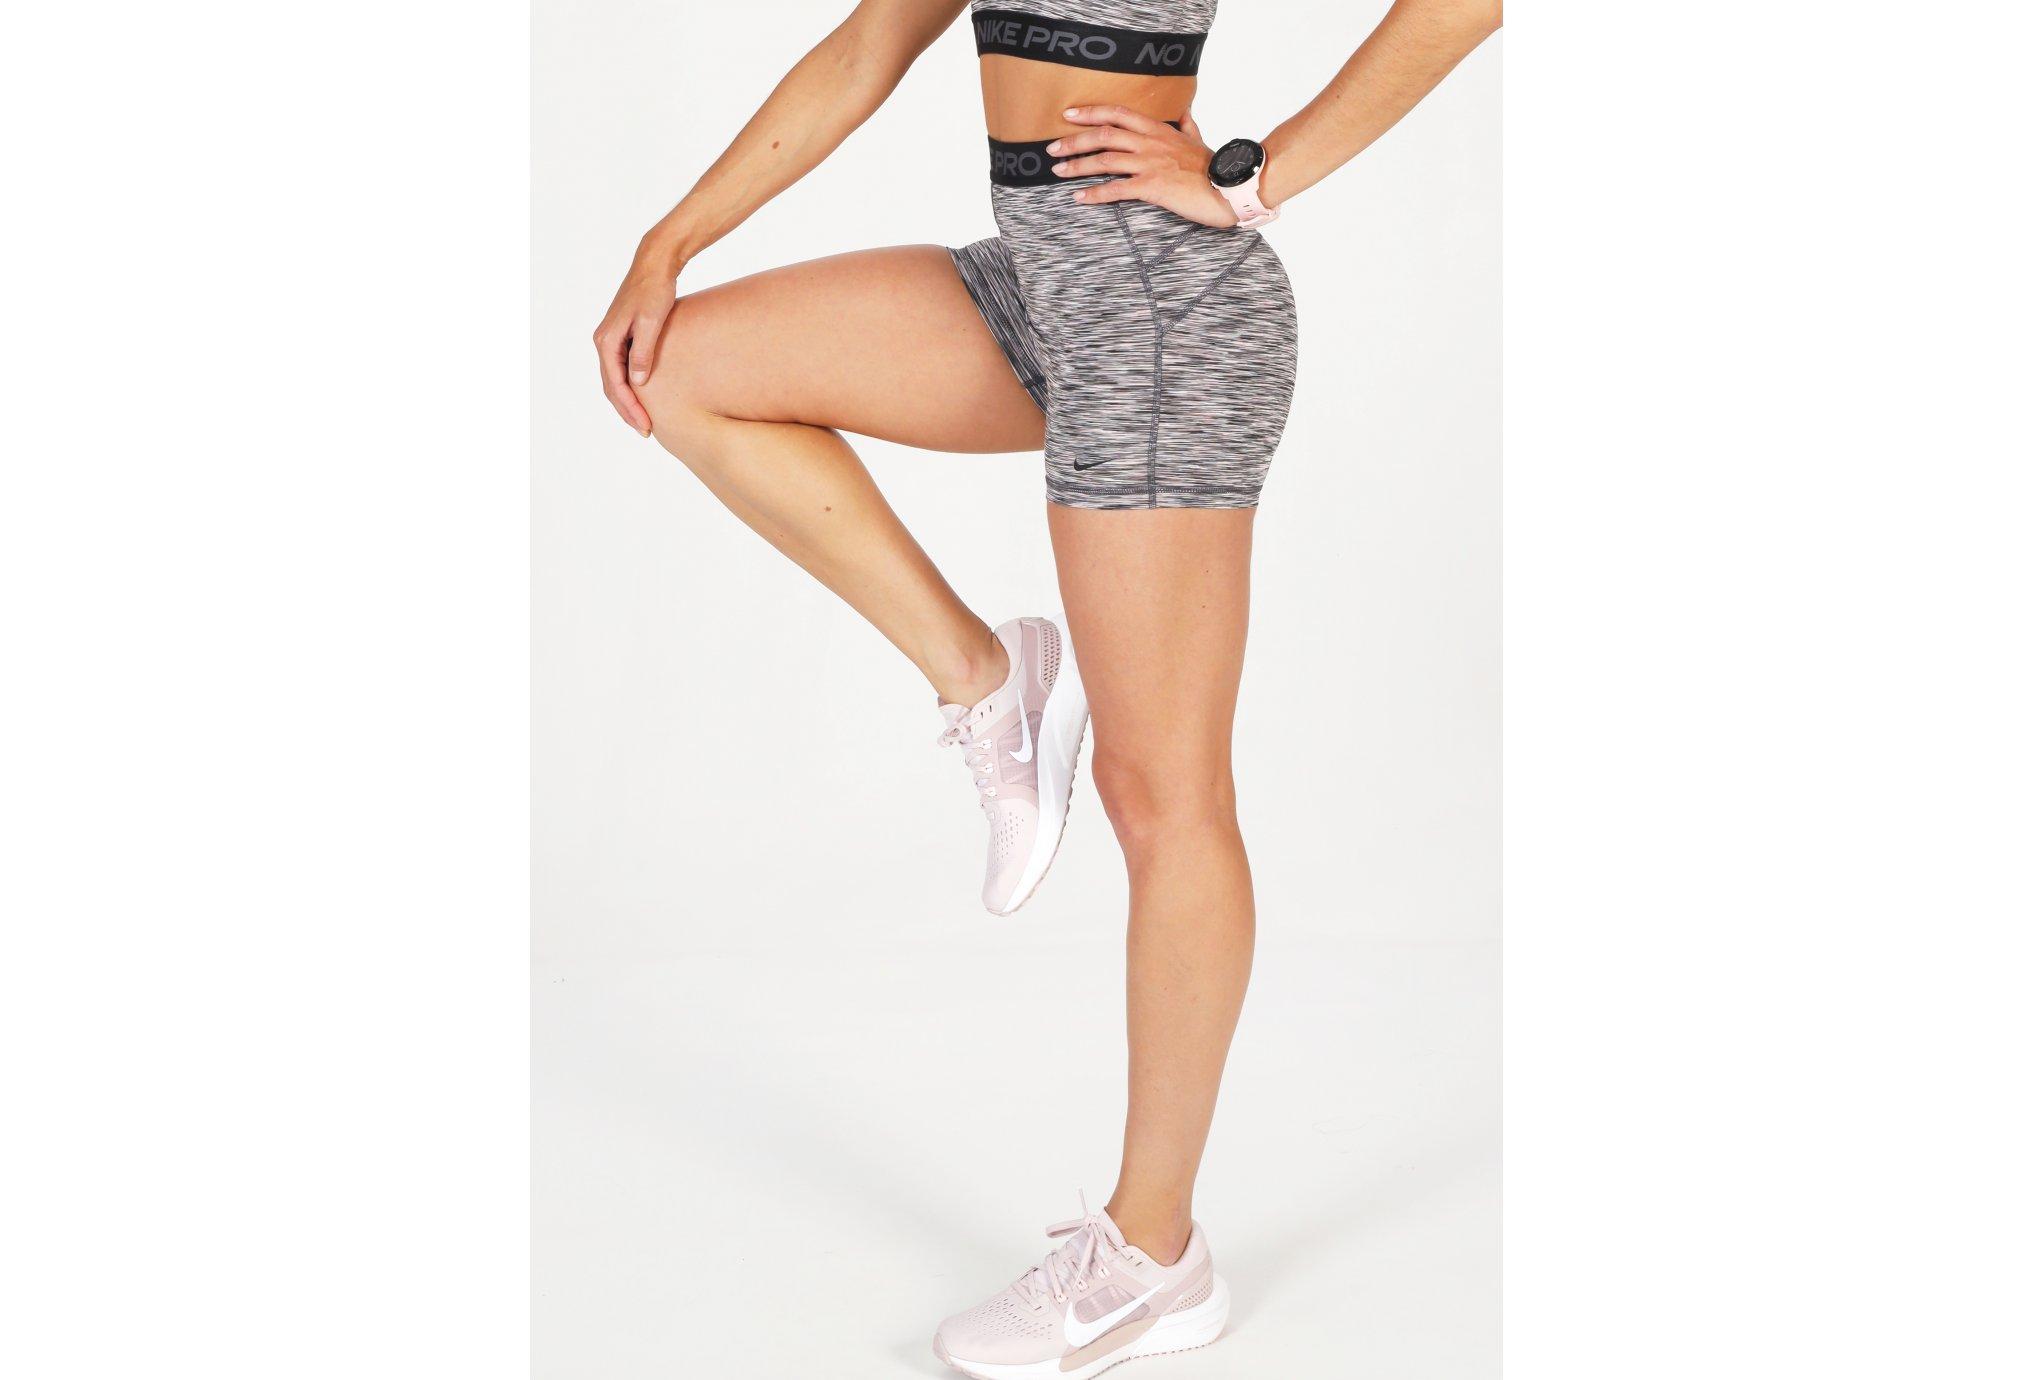 Nike Pro Space-Dye W vêtement running femme